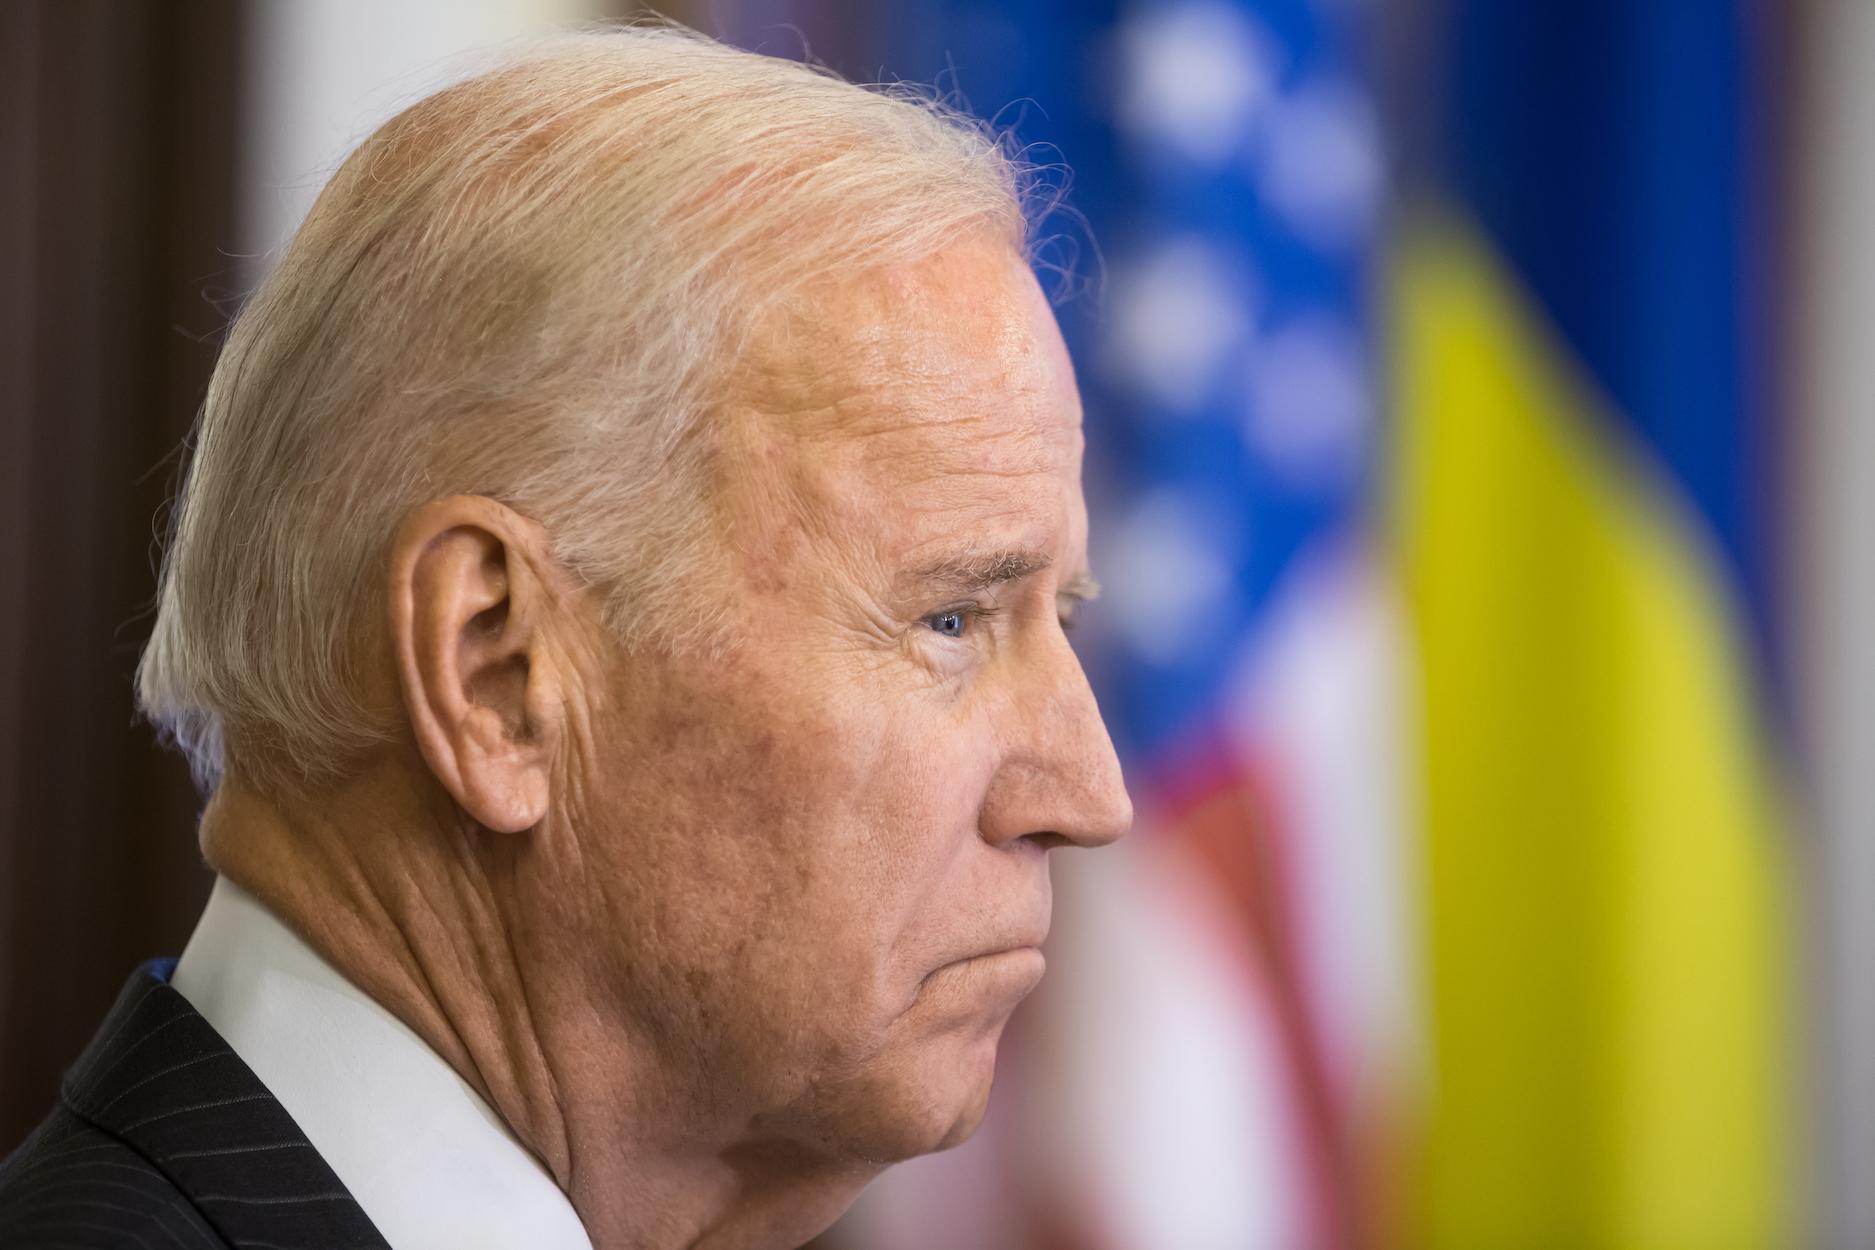 President Trump Destroys Joe Biden With Enthusiastic Supporters